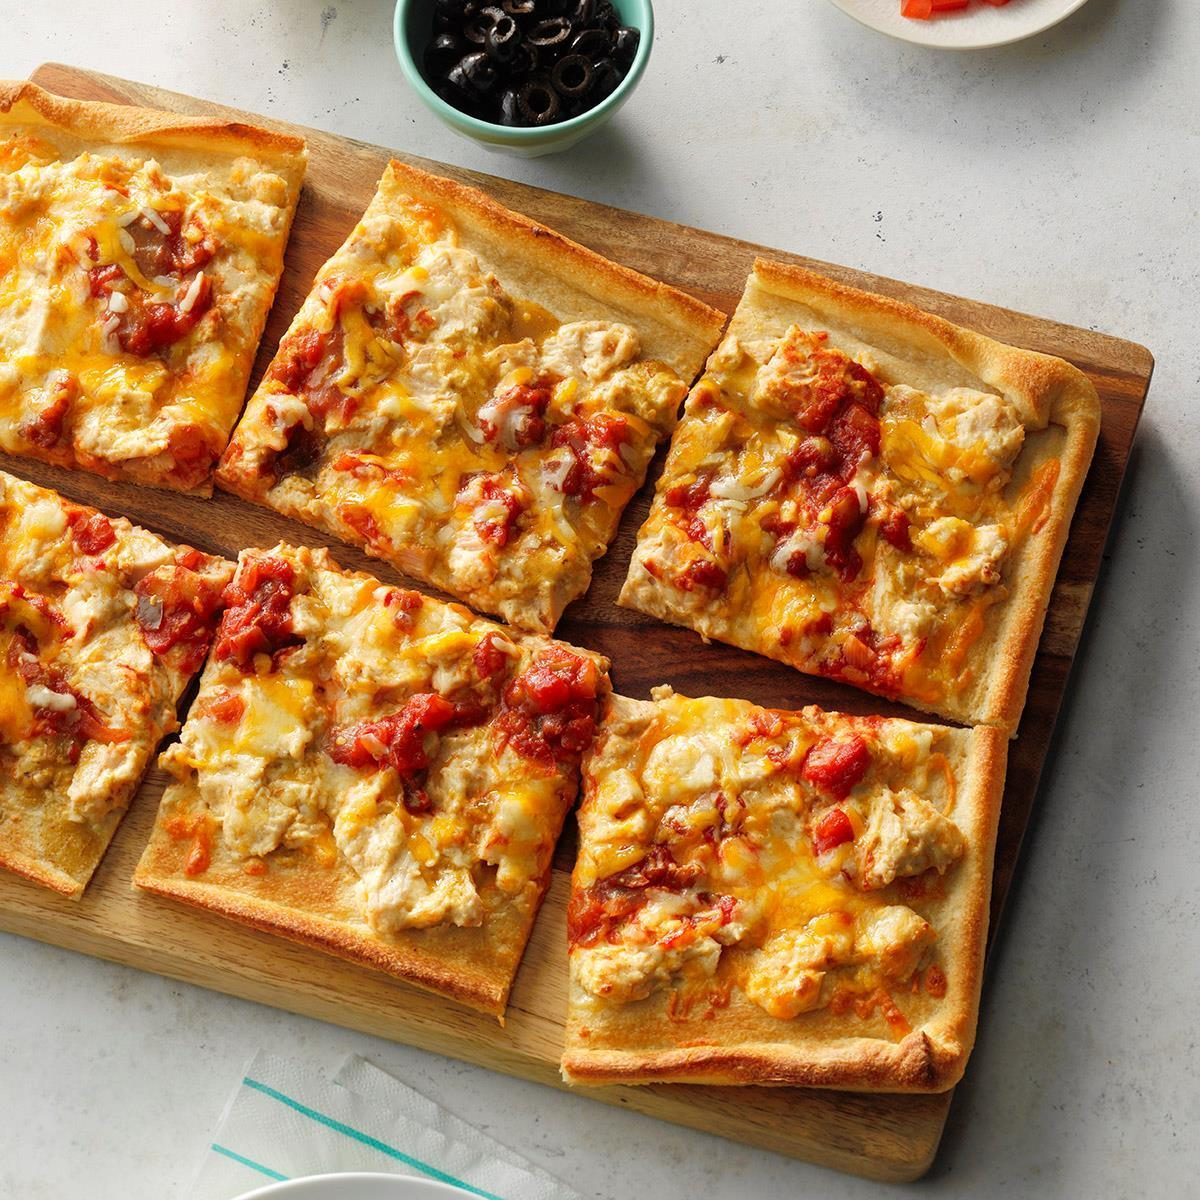 Creamy Chicken Enchilada Pizza Exps Sdjj19 161841 E02 12 6b 4